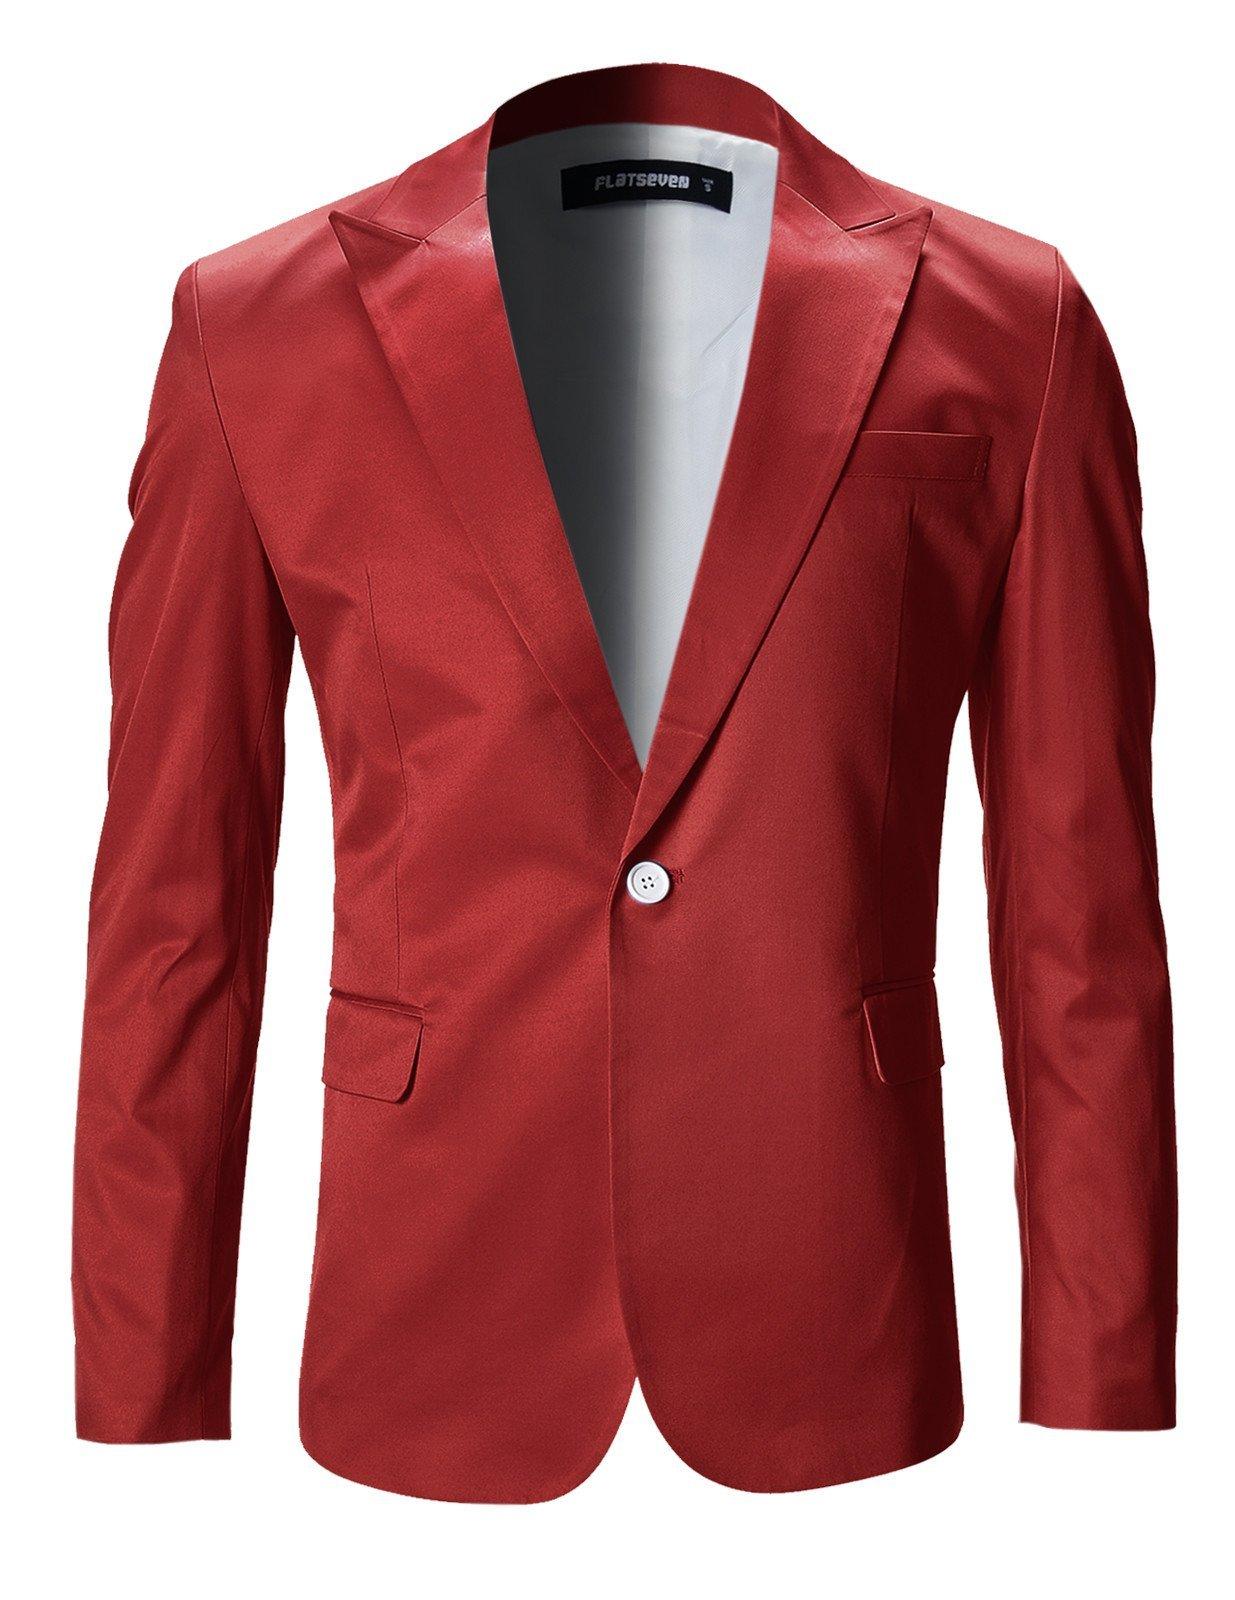 FLATSEVEN Mens Slim Fit Stylish Peaked Lapel Blazer Jacket (BJ200) Red, XS